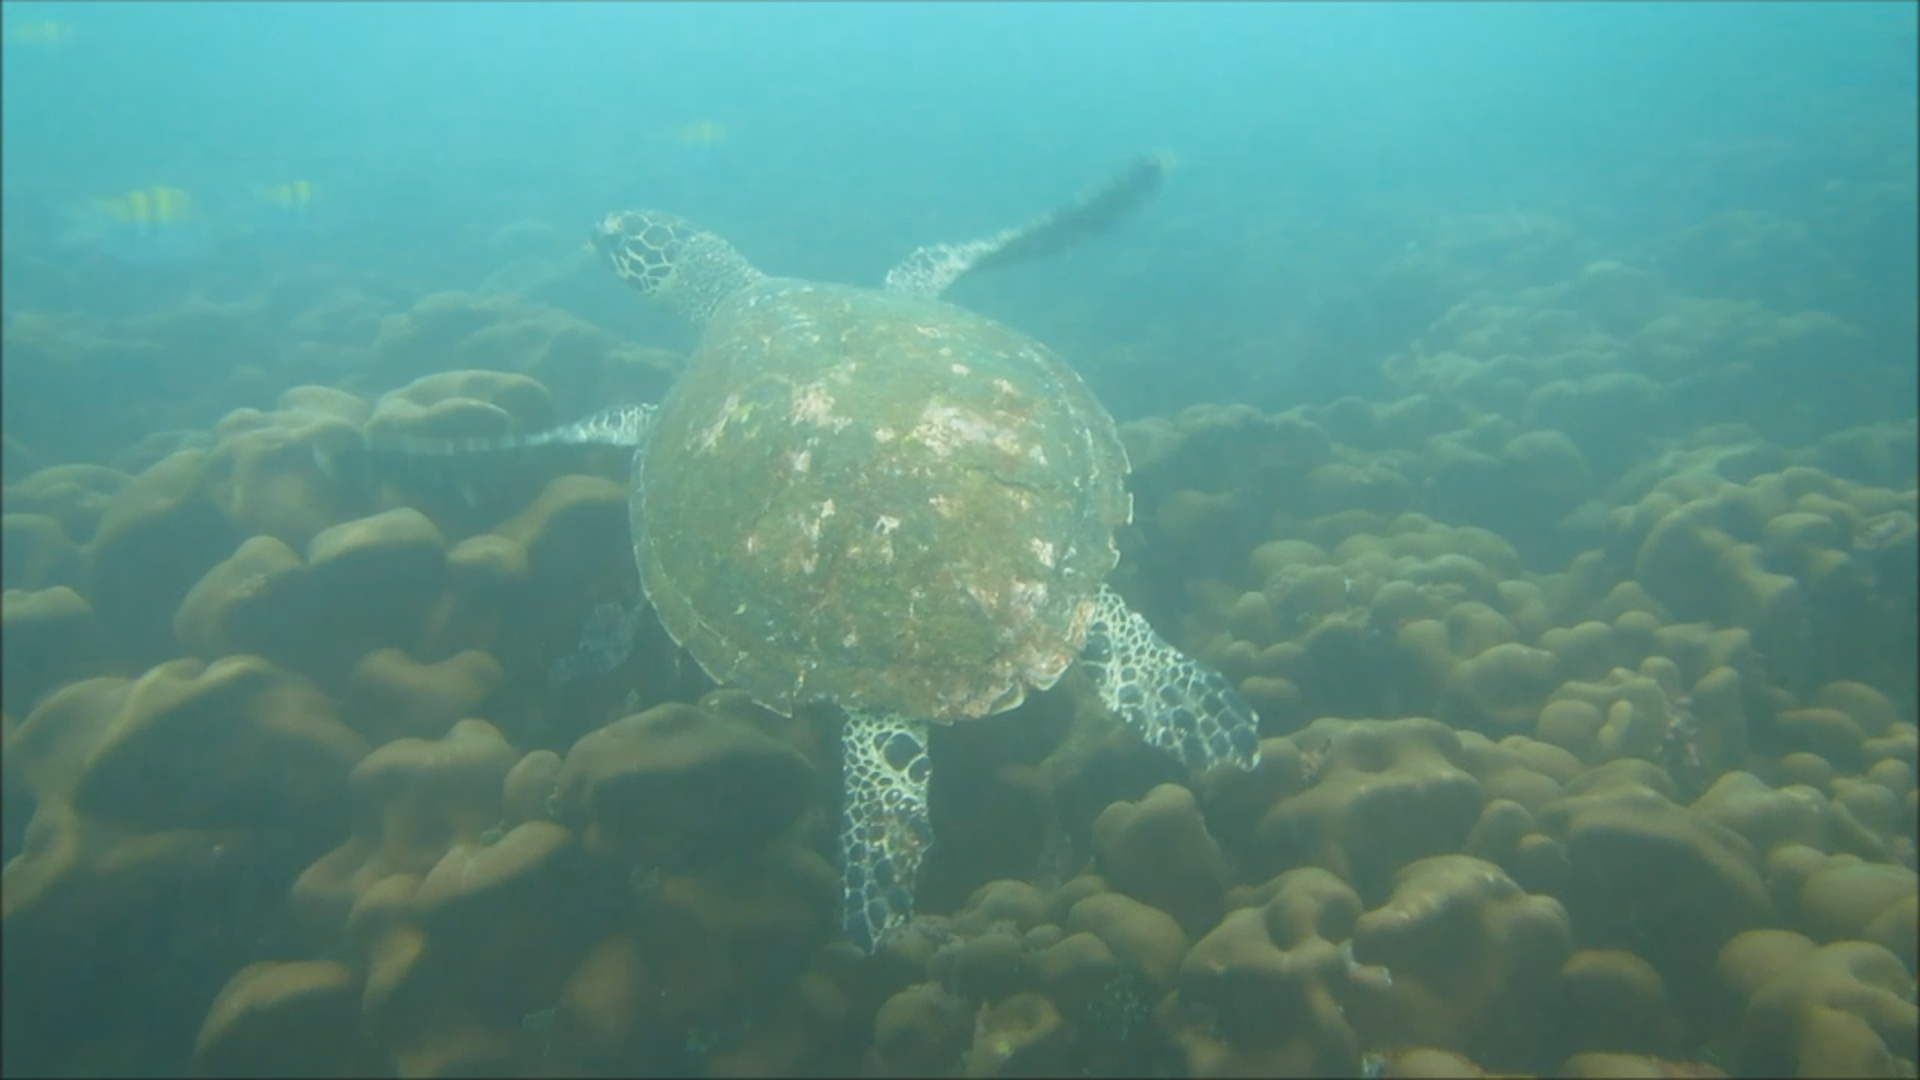 A sea turtle at Machalilla National Park, Ecuador.